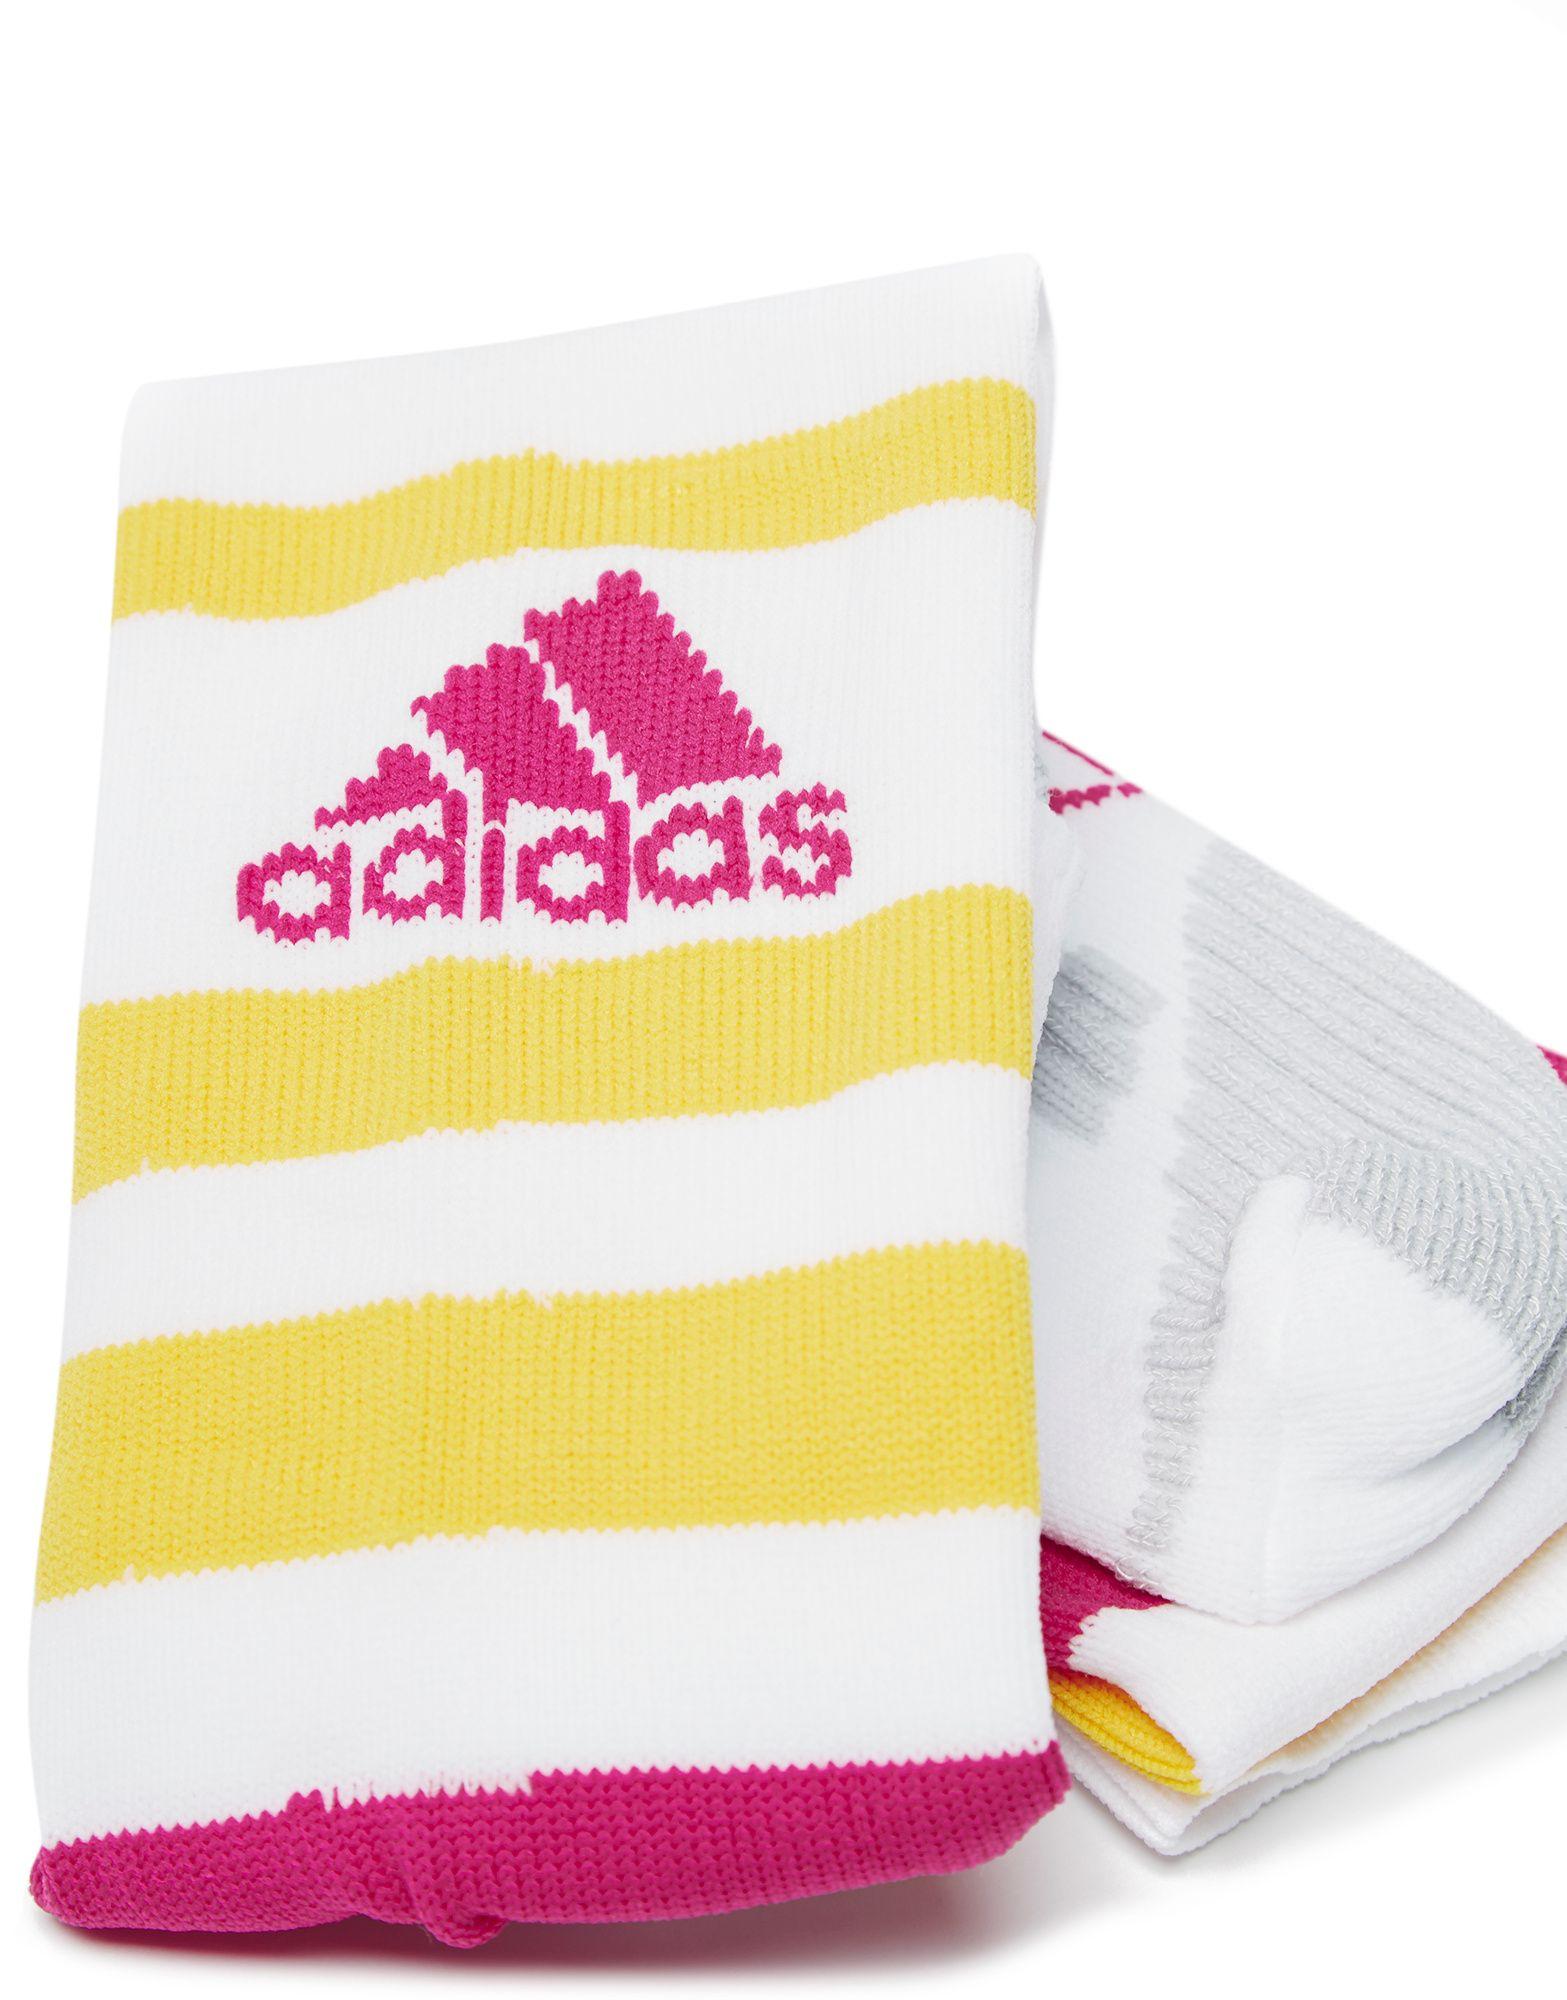 adidas Scotland 2014 Socks